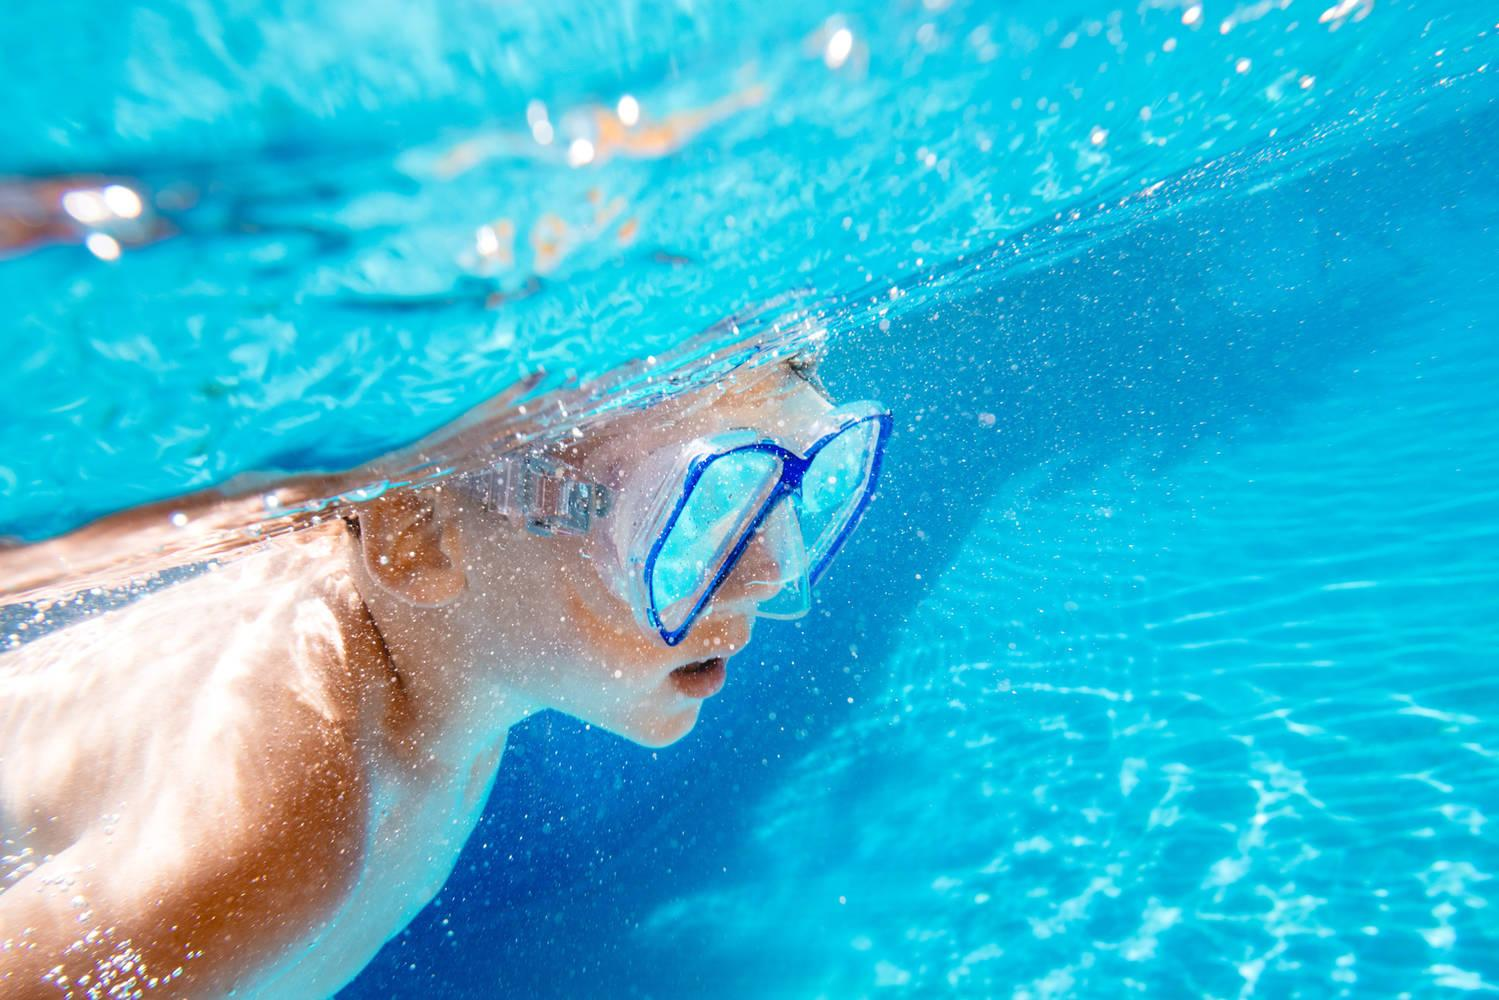 Zwemvaardigheid / Life saver